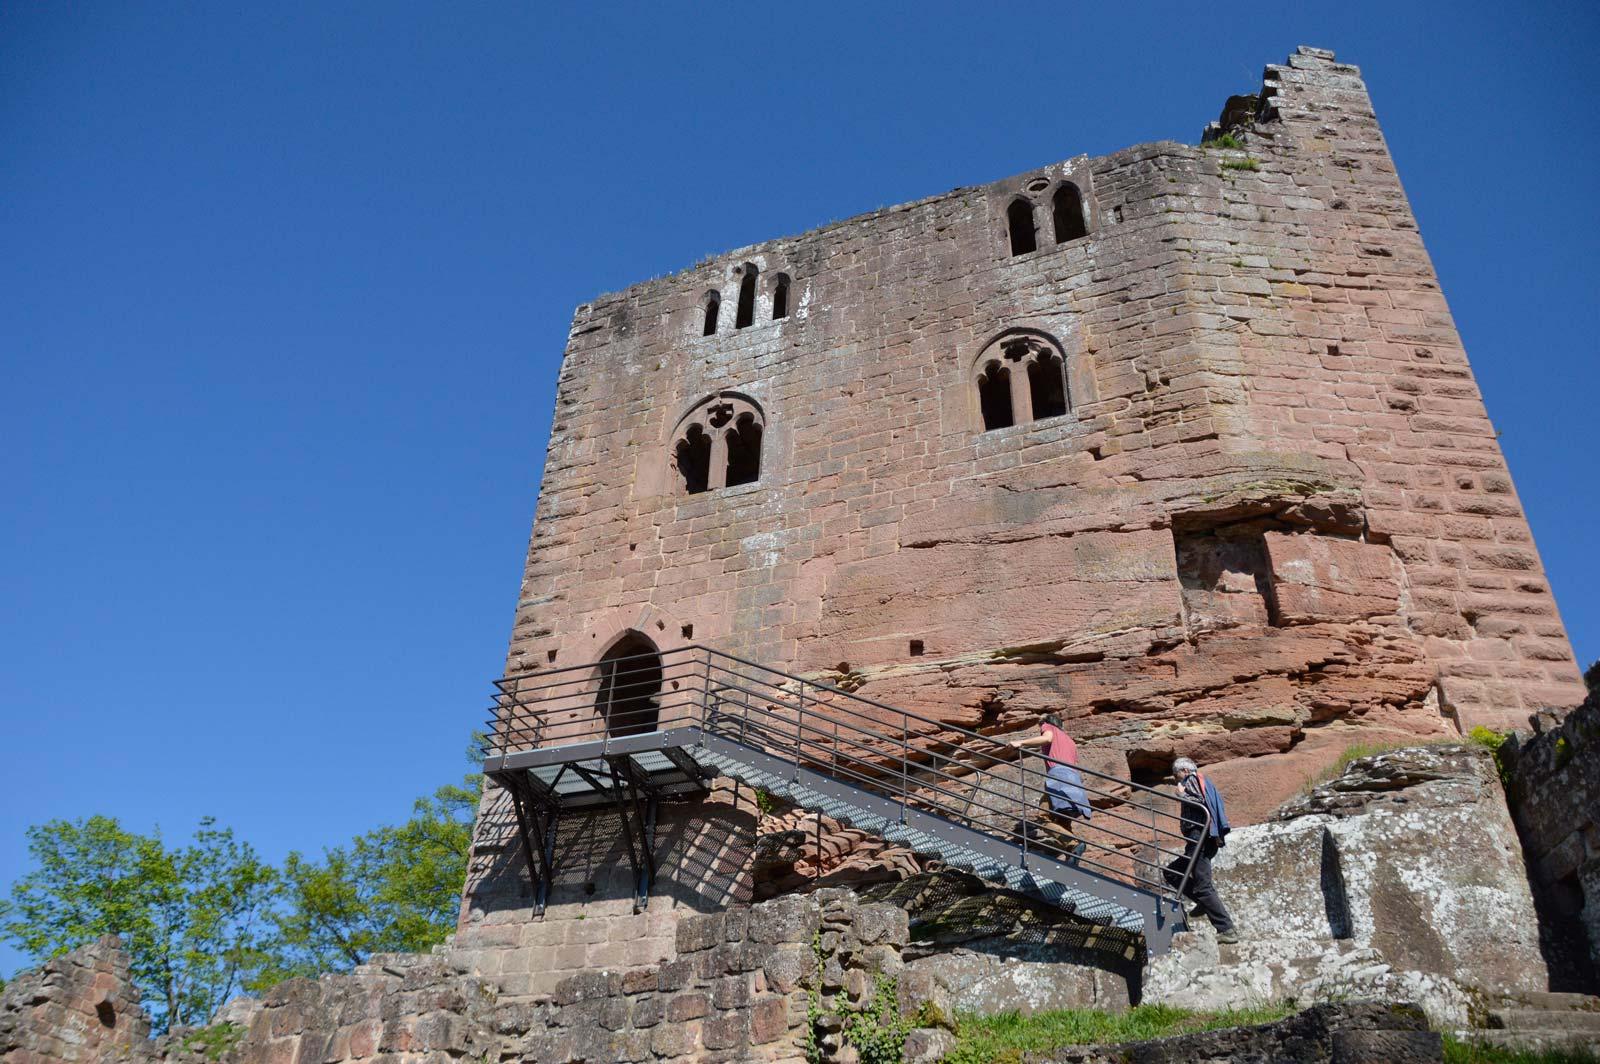 Castle New Windstein